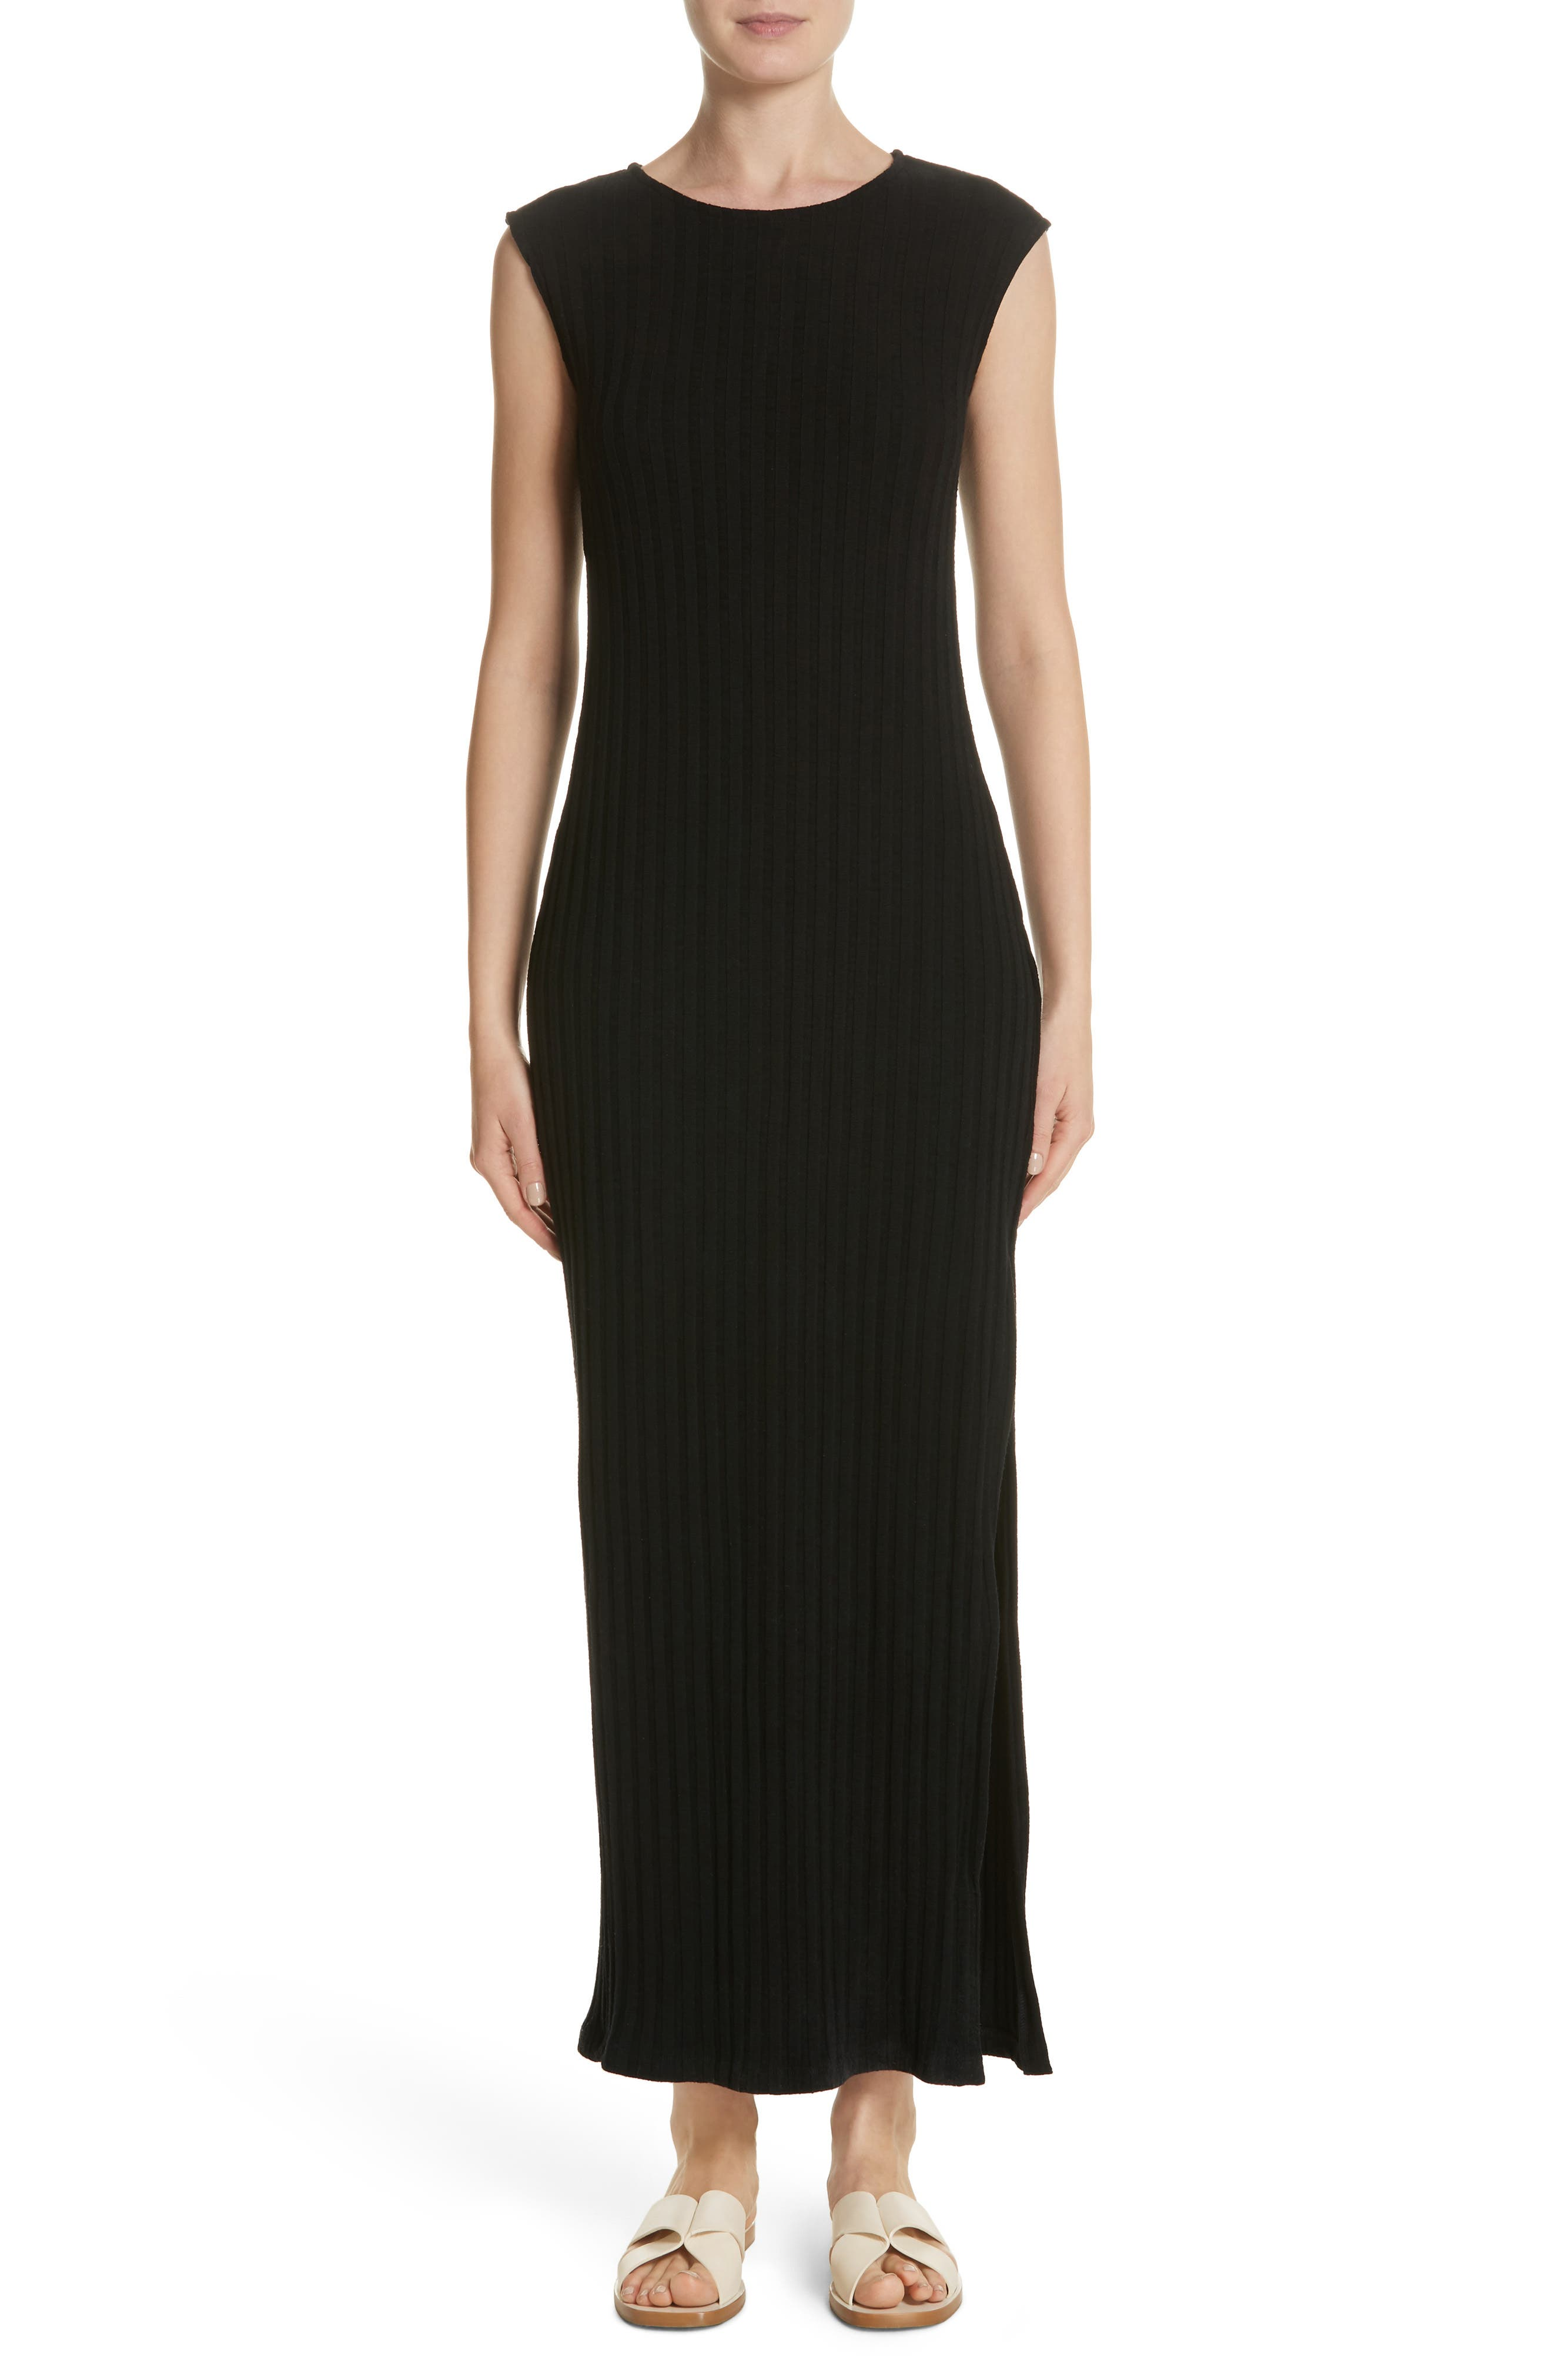 Main Image - Simon Miller Tali Stretch Ribbed Body-Con Dress